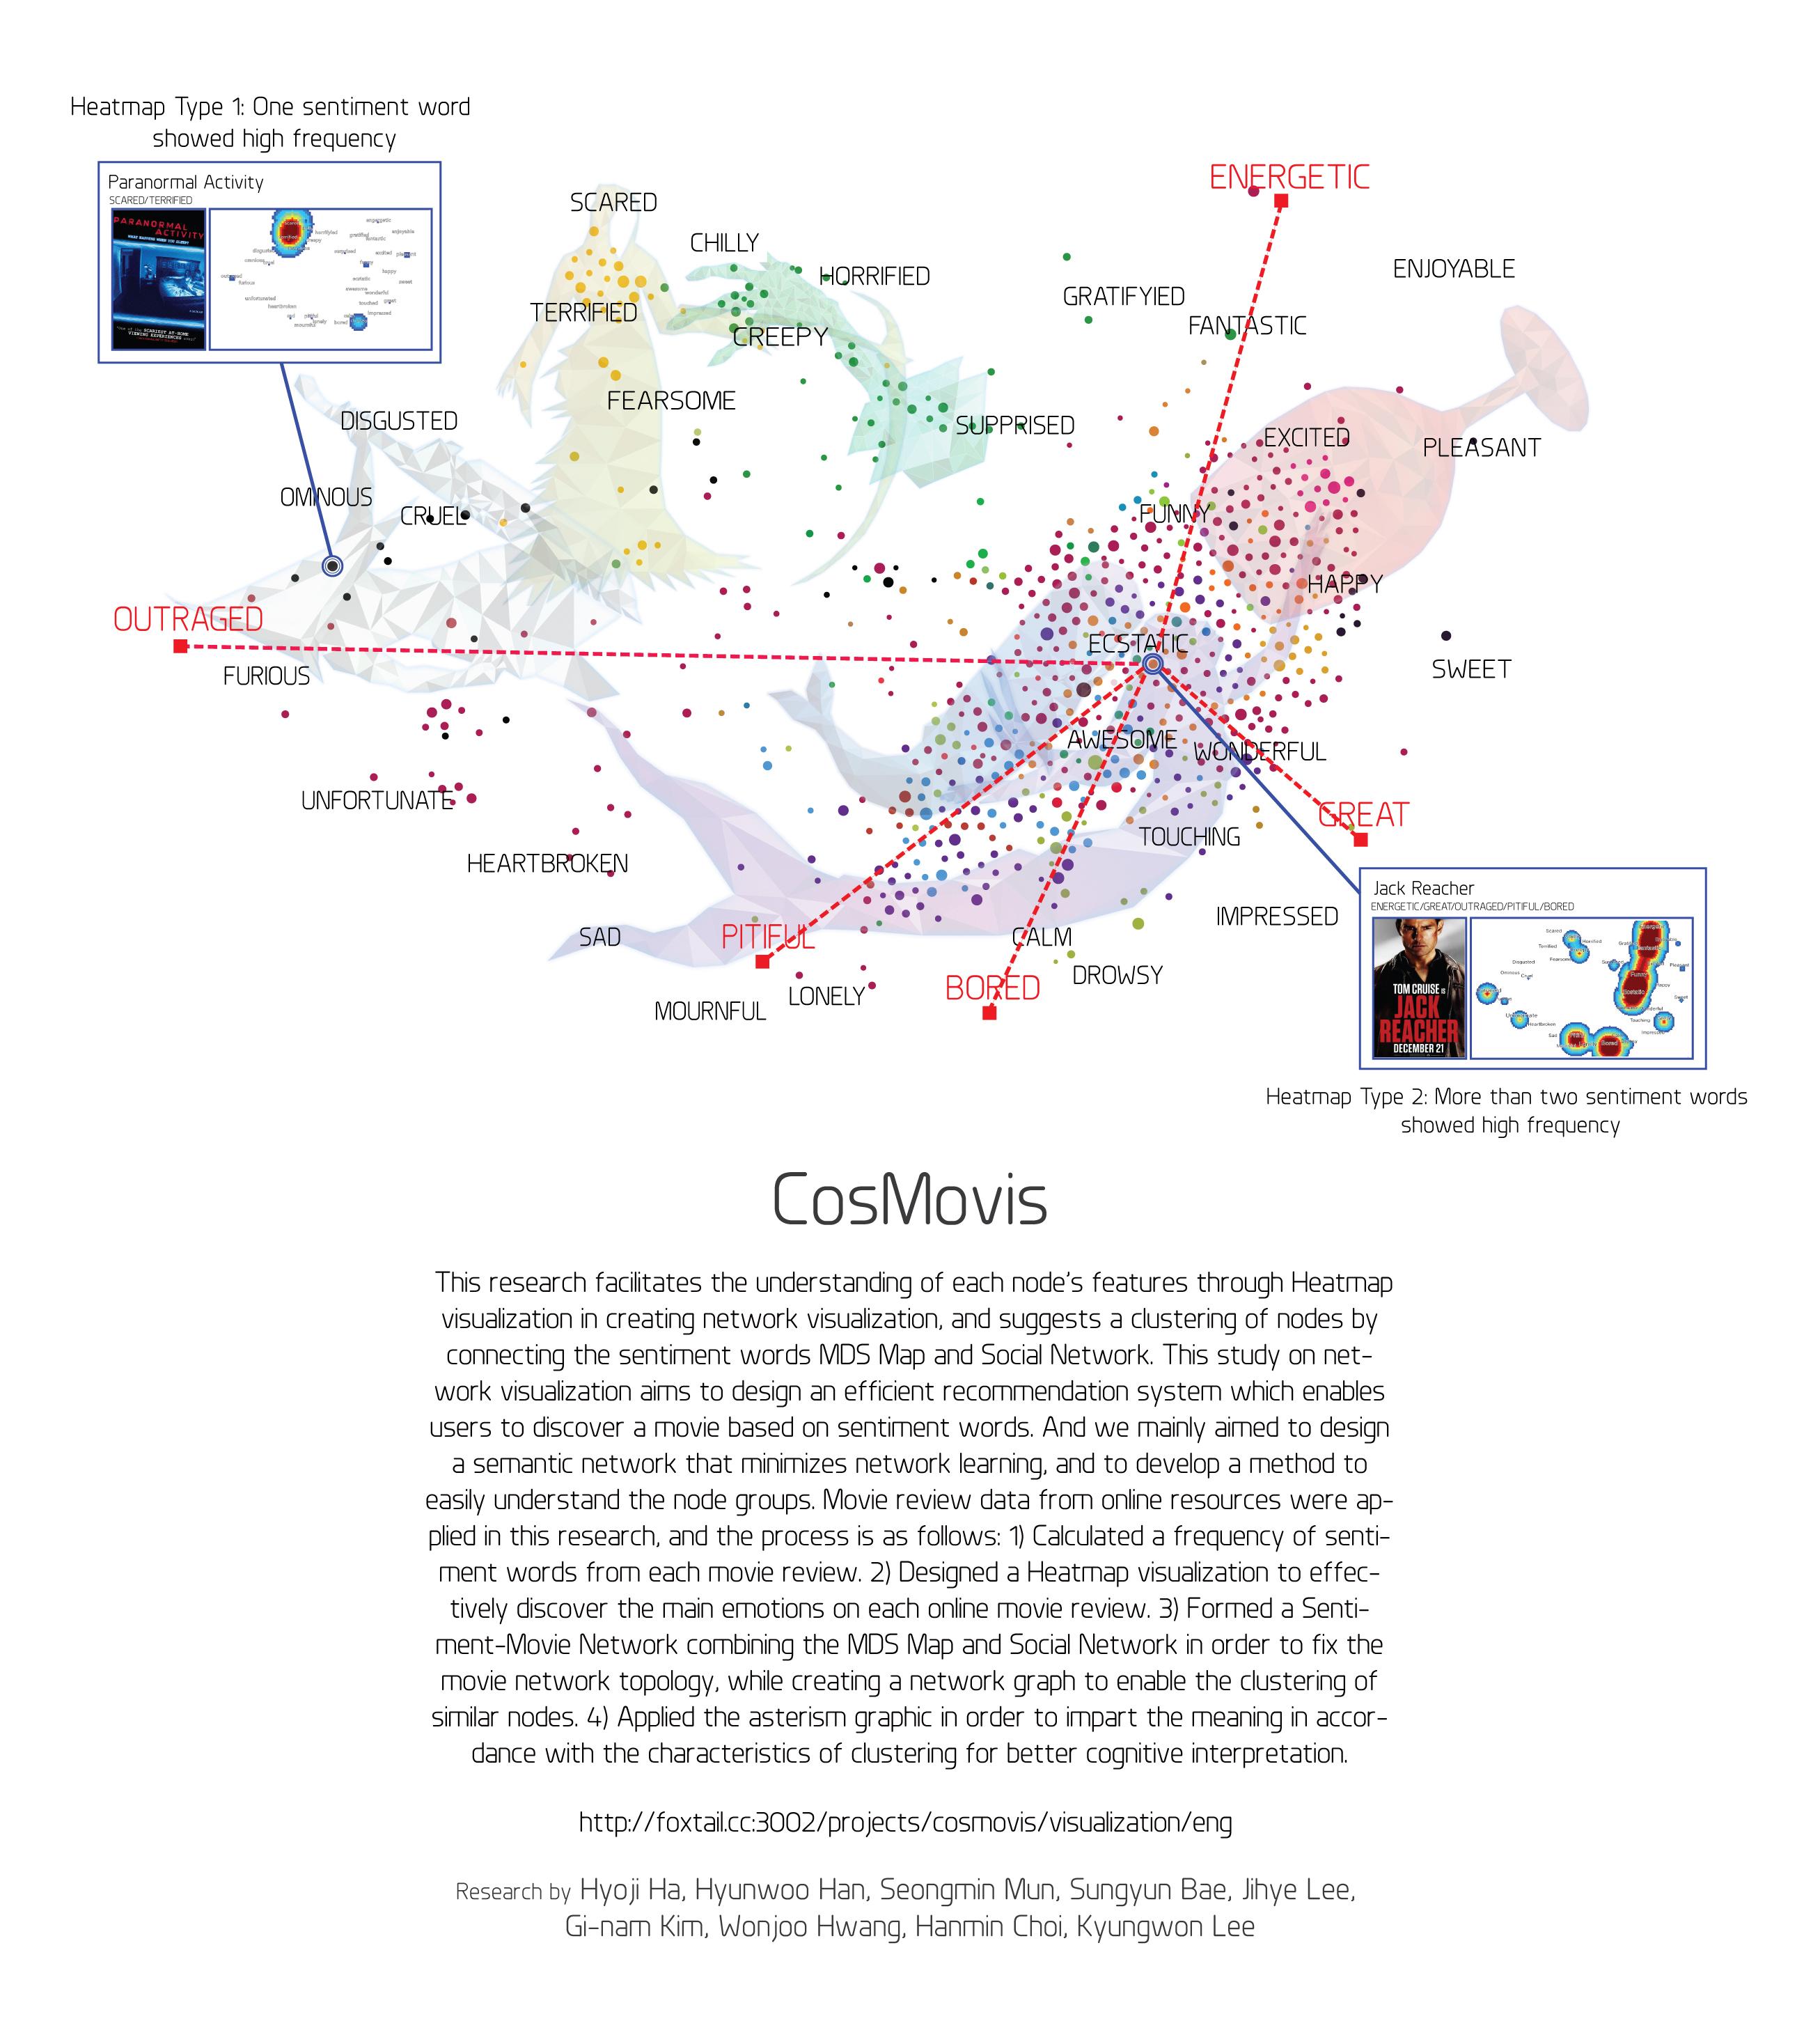 CosMovis: Semantic Network Visualization based on Sentiment